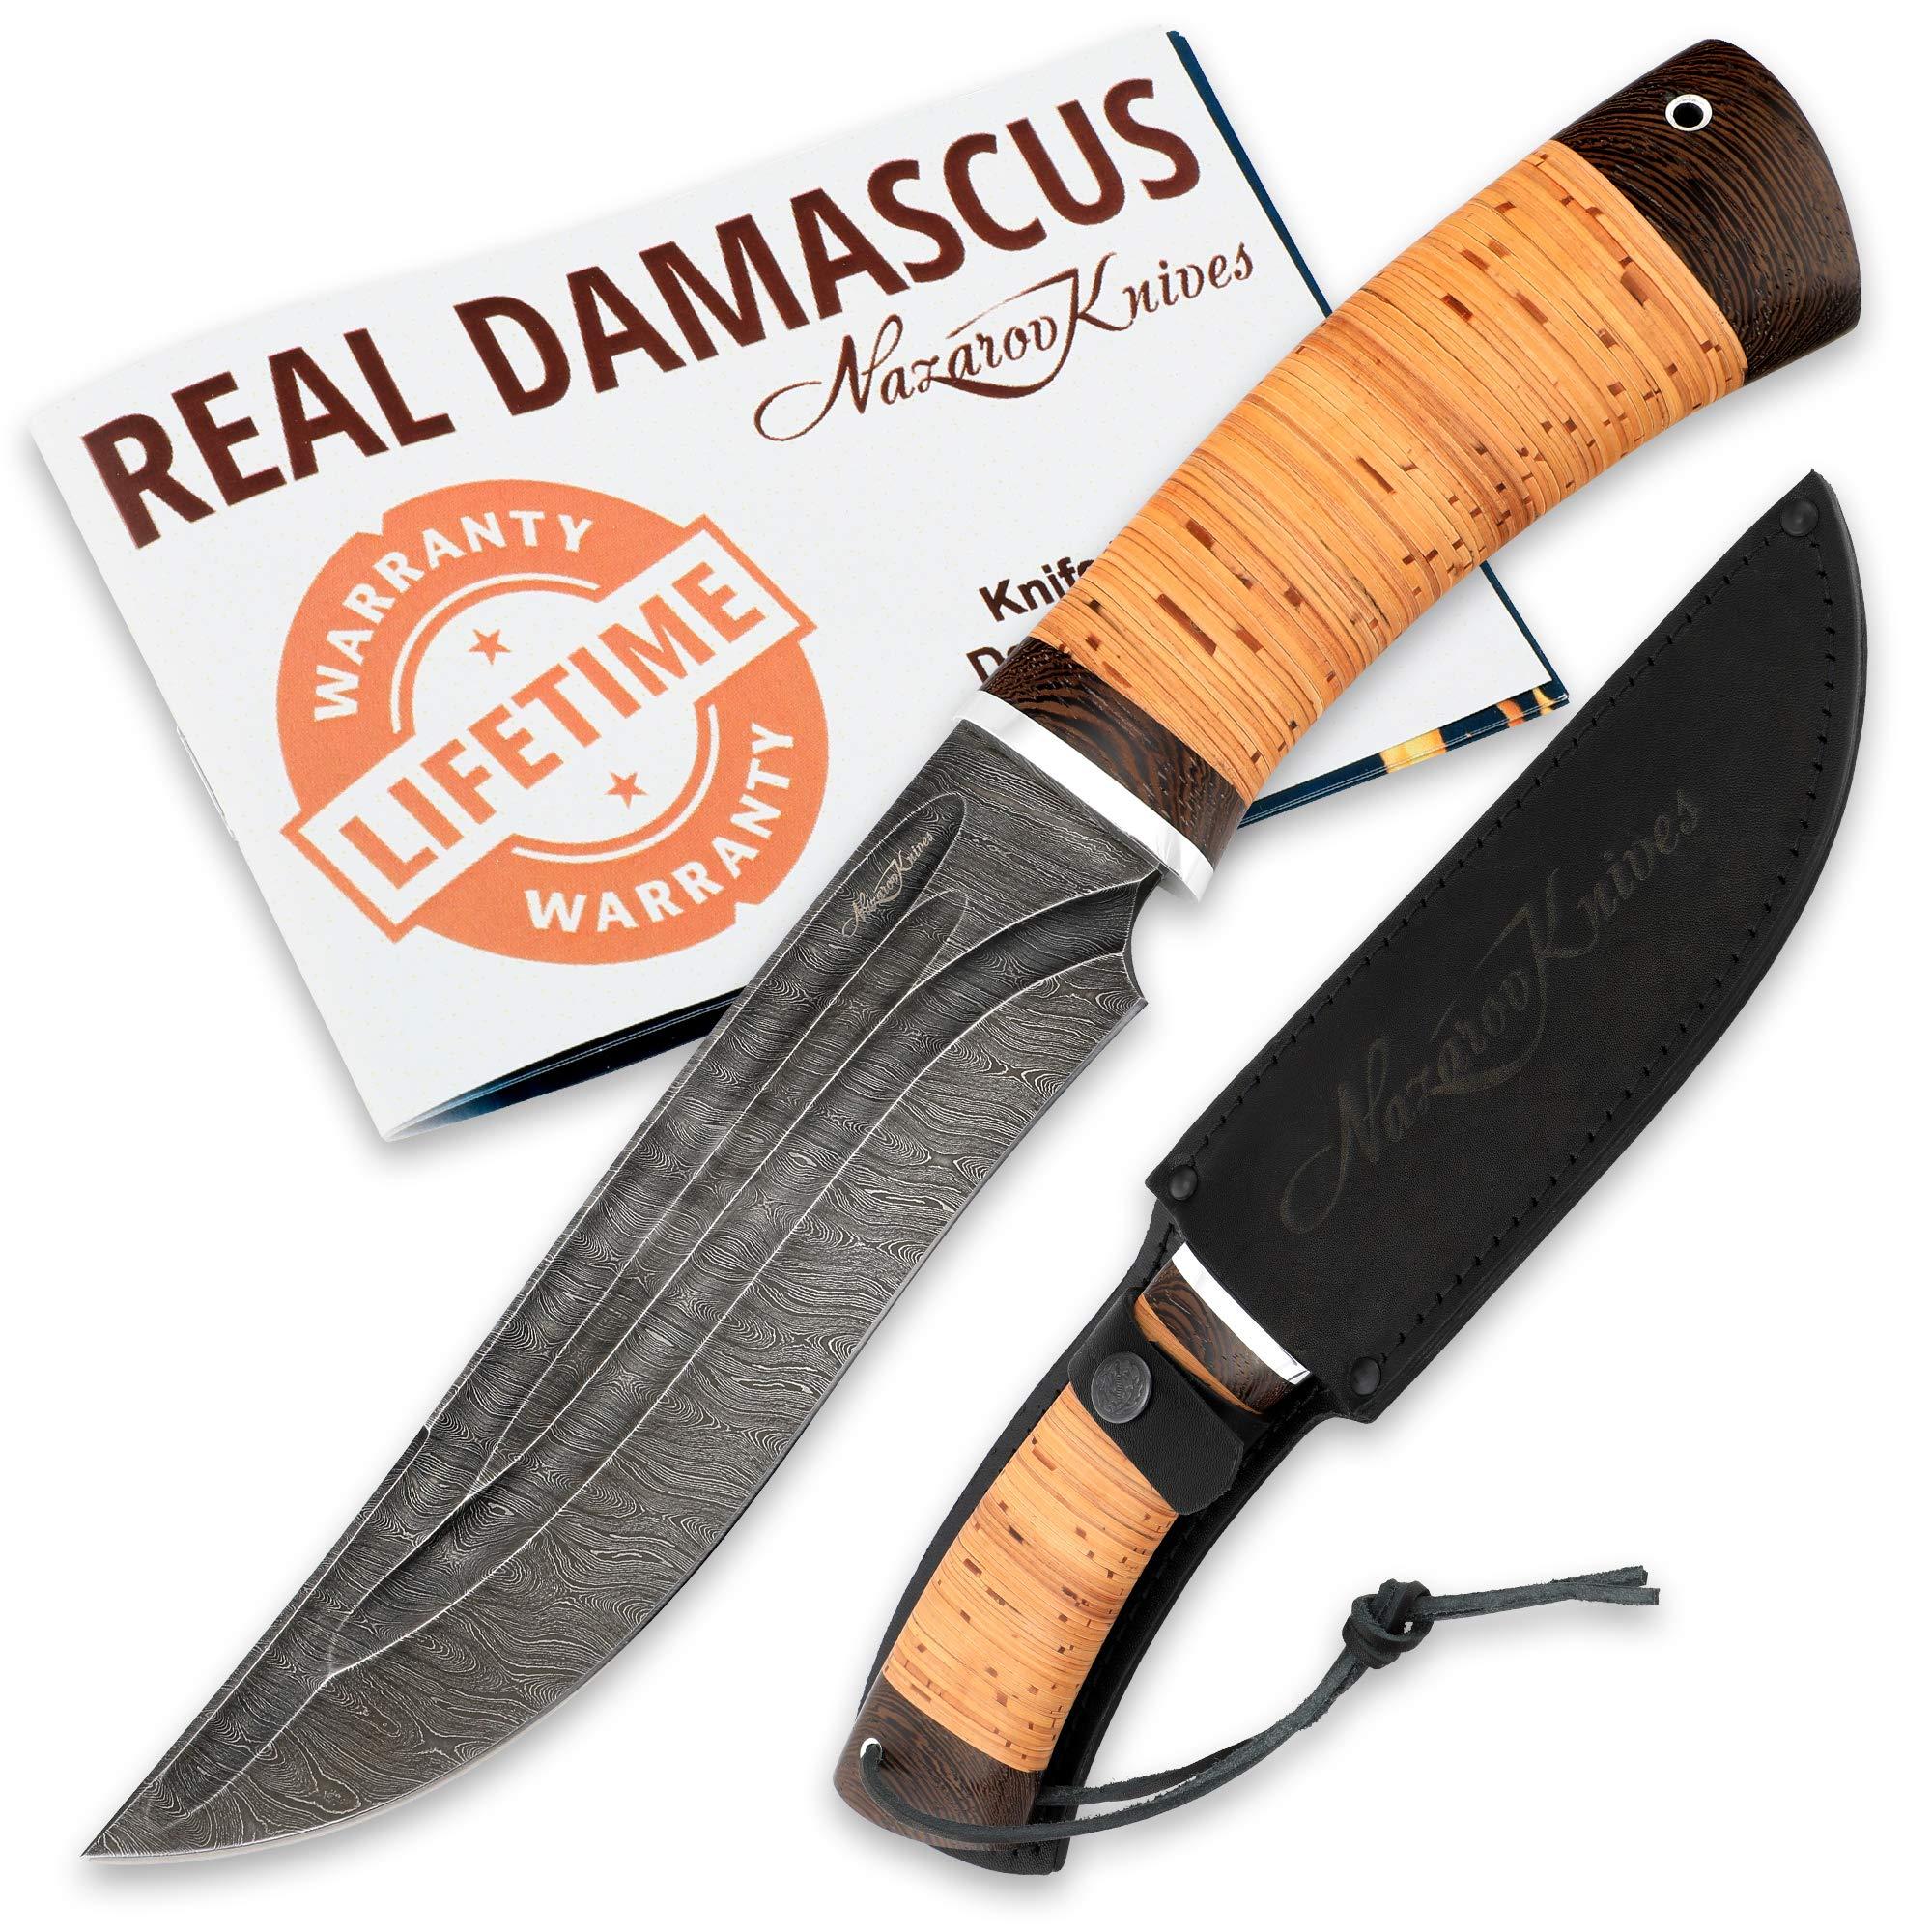 Skinning Knives for Hunting - Real Damascus Knife - Birchbark - KATRAN - Leather Sheath by Nazarov Knives (Image #1)